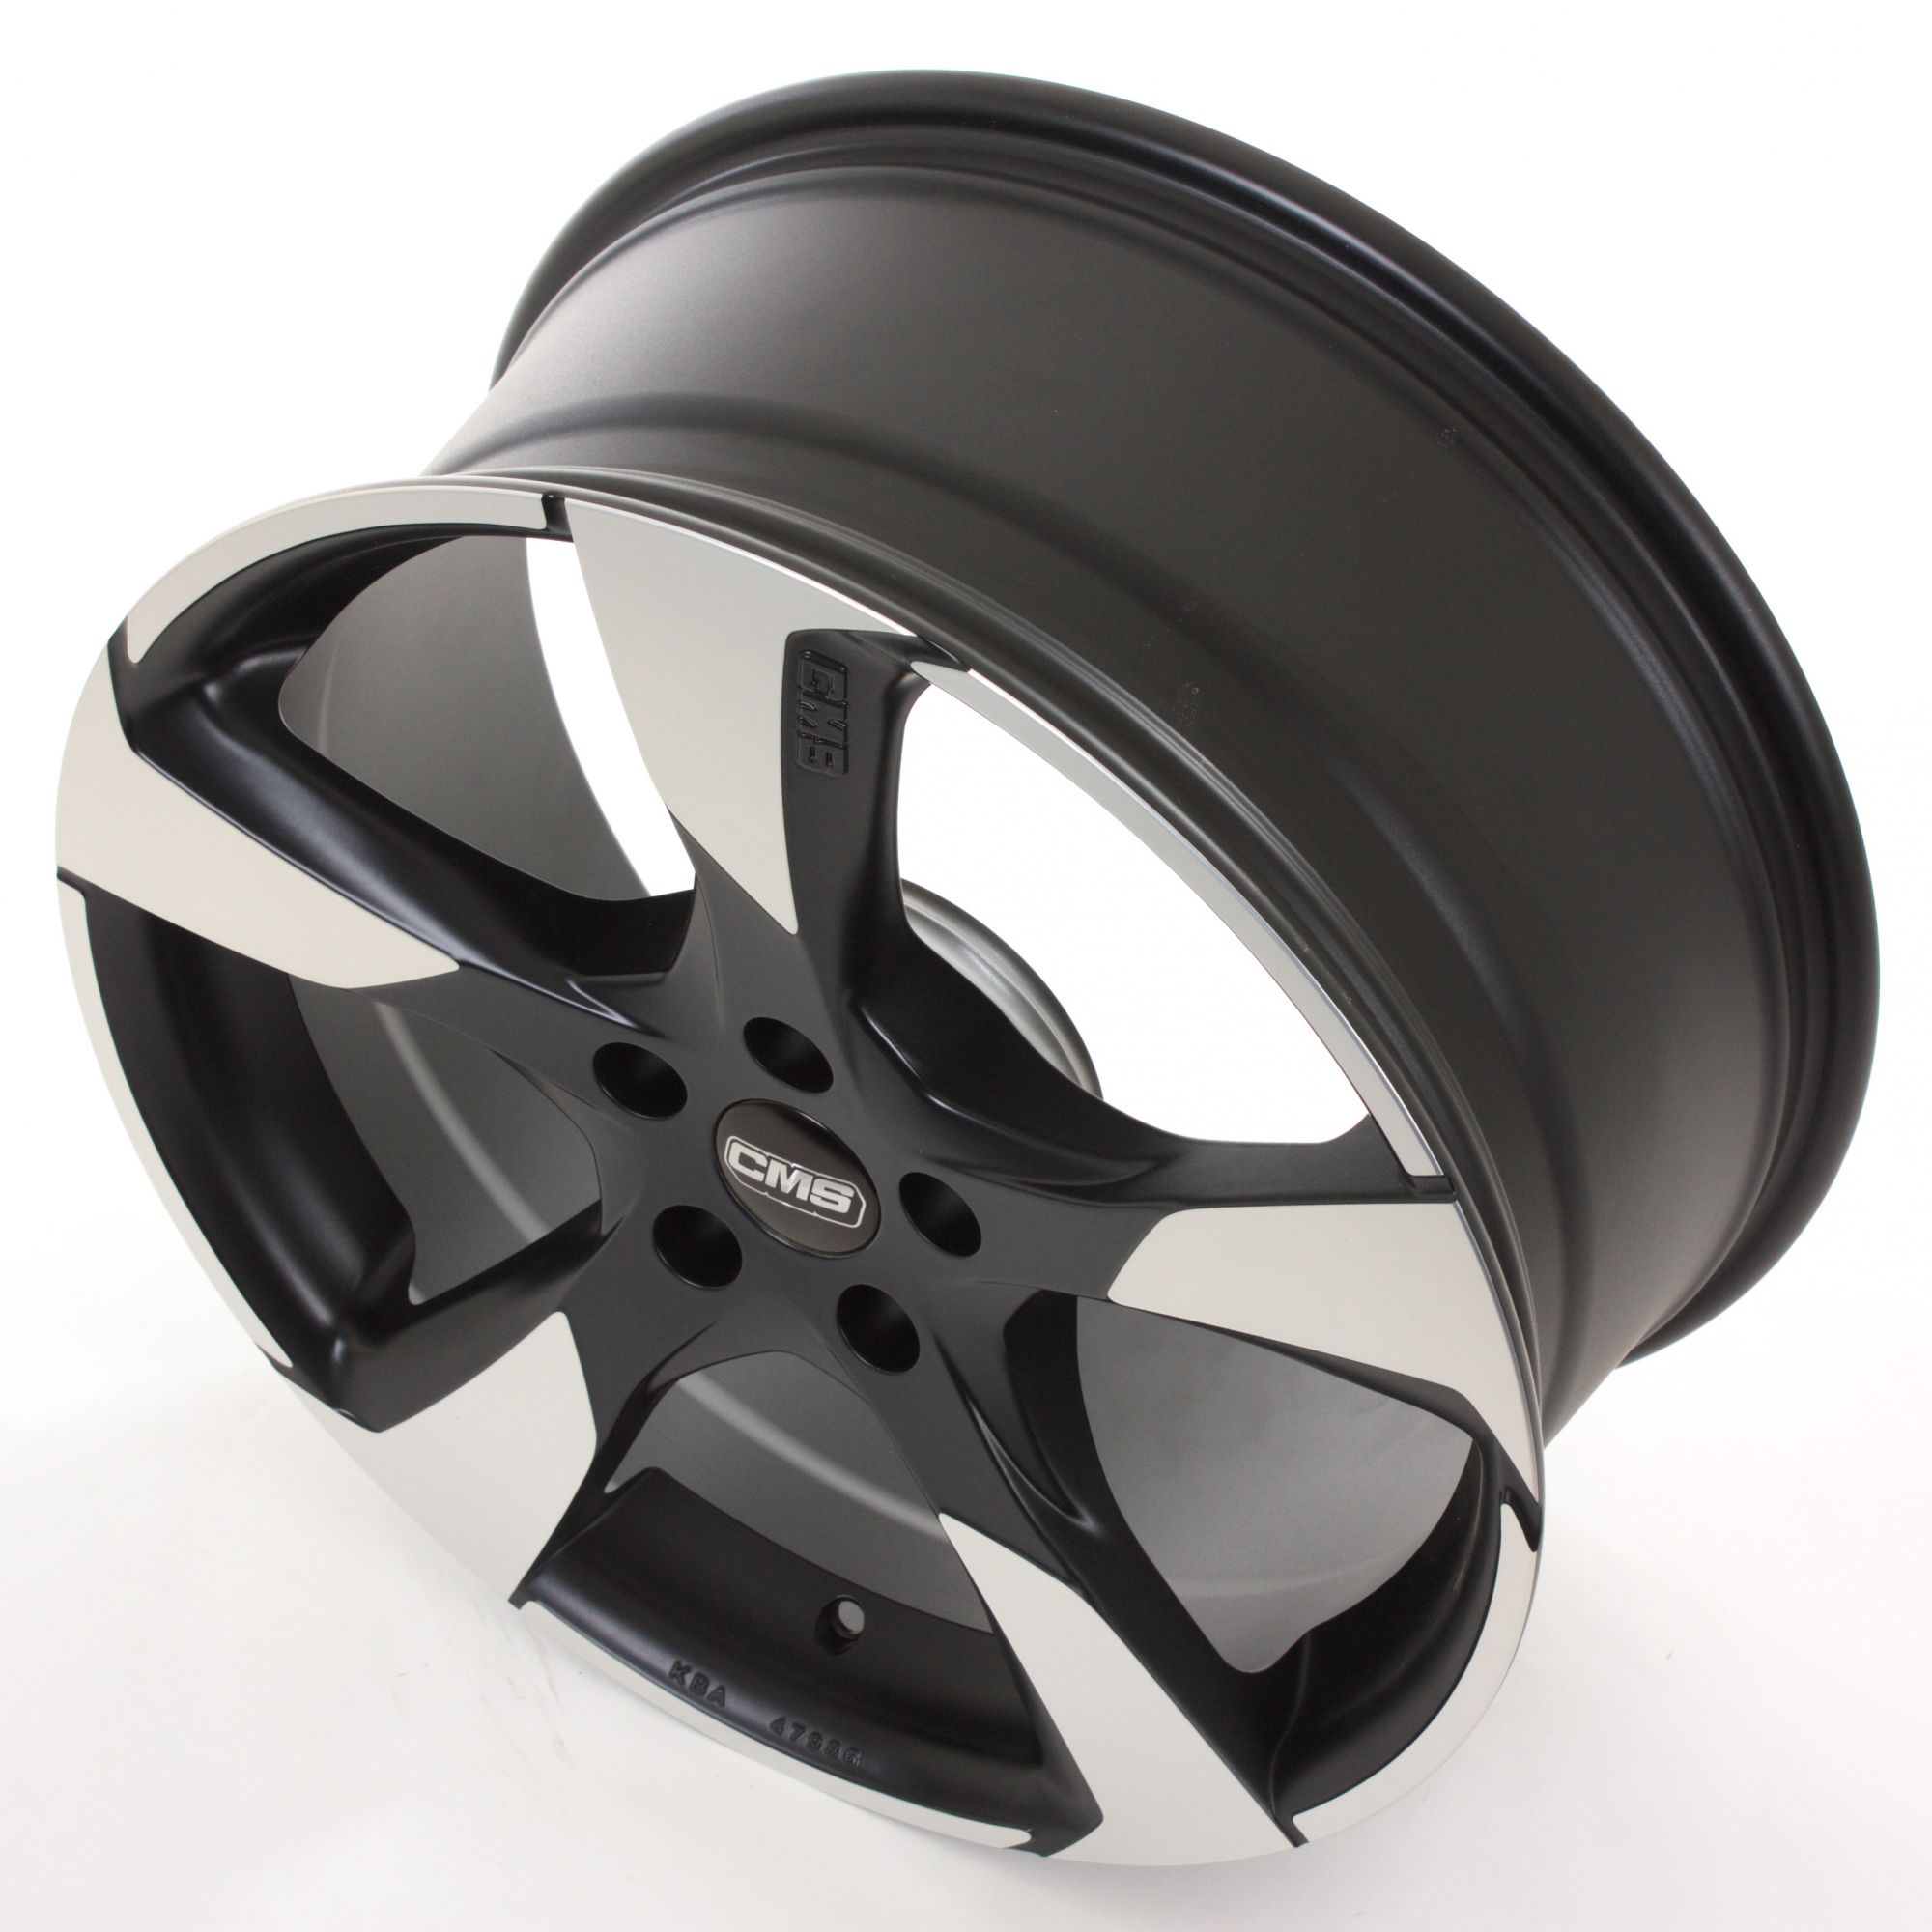 cms c18 felgen diamond matt black schwarz mehrfarbig in 16 zoll. Black Bedroom Furniture Sets. Home Design Ideas